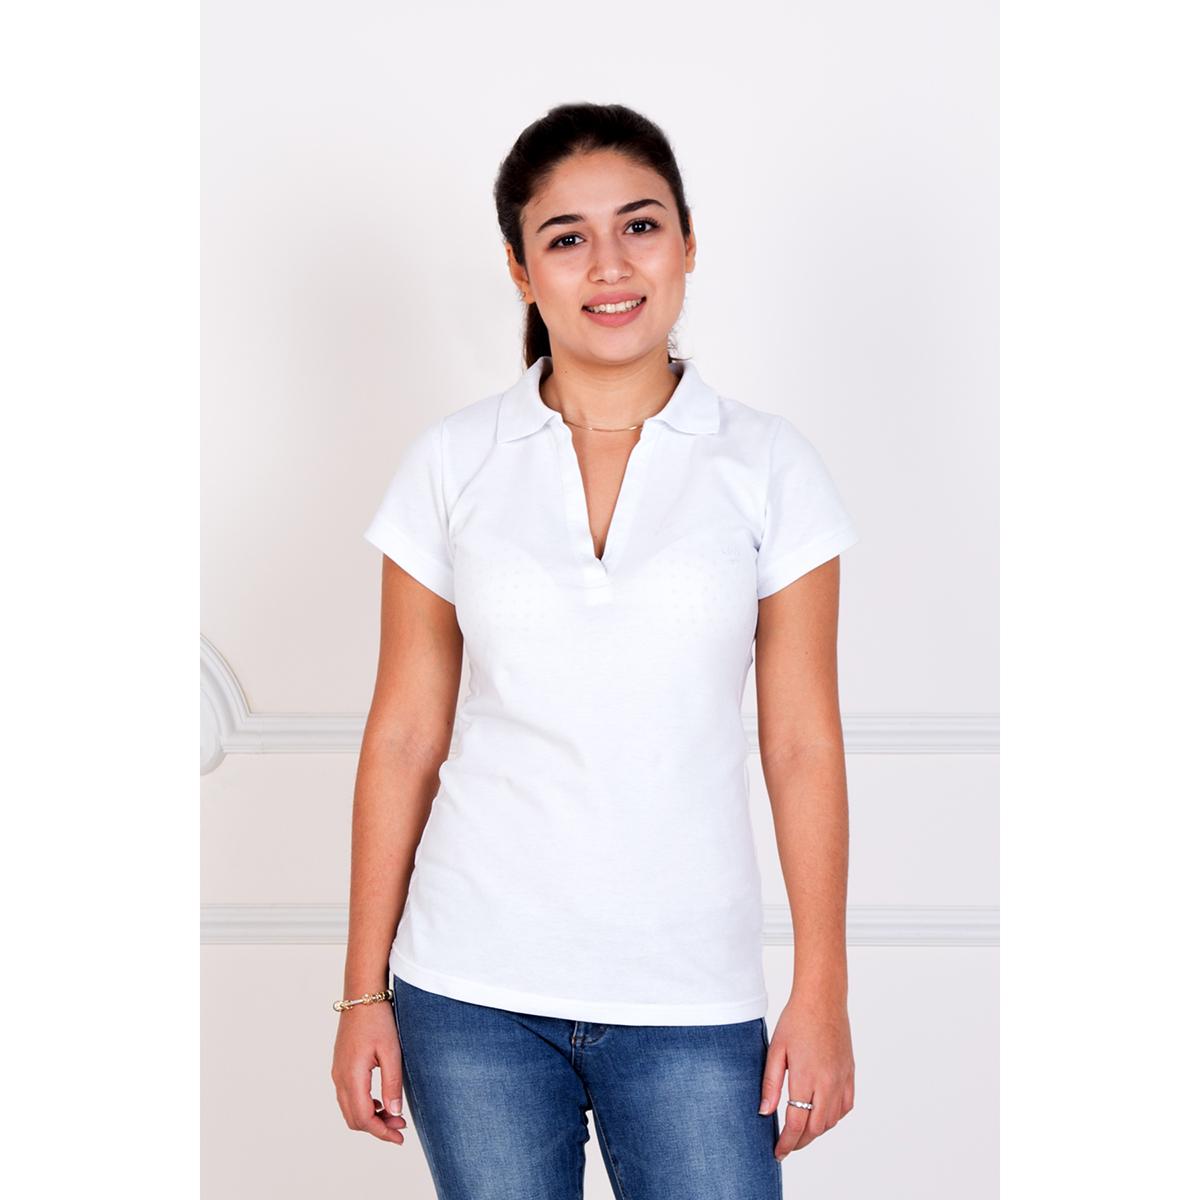 Женская футболка-поло Шерт Белый, размер 48Блузки, майки, кофты<br>Обхват груди:96 см<br>Обхват талии:78 см<br>Обхват бедер:104 см<br>Рост:167 см<br><br>Тип: Жен. футболка<br>Размер: 48<br>Материал: Пике